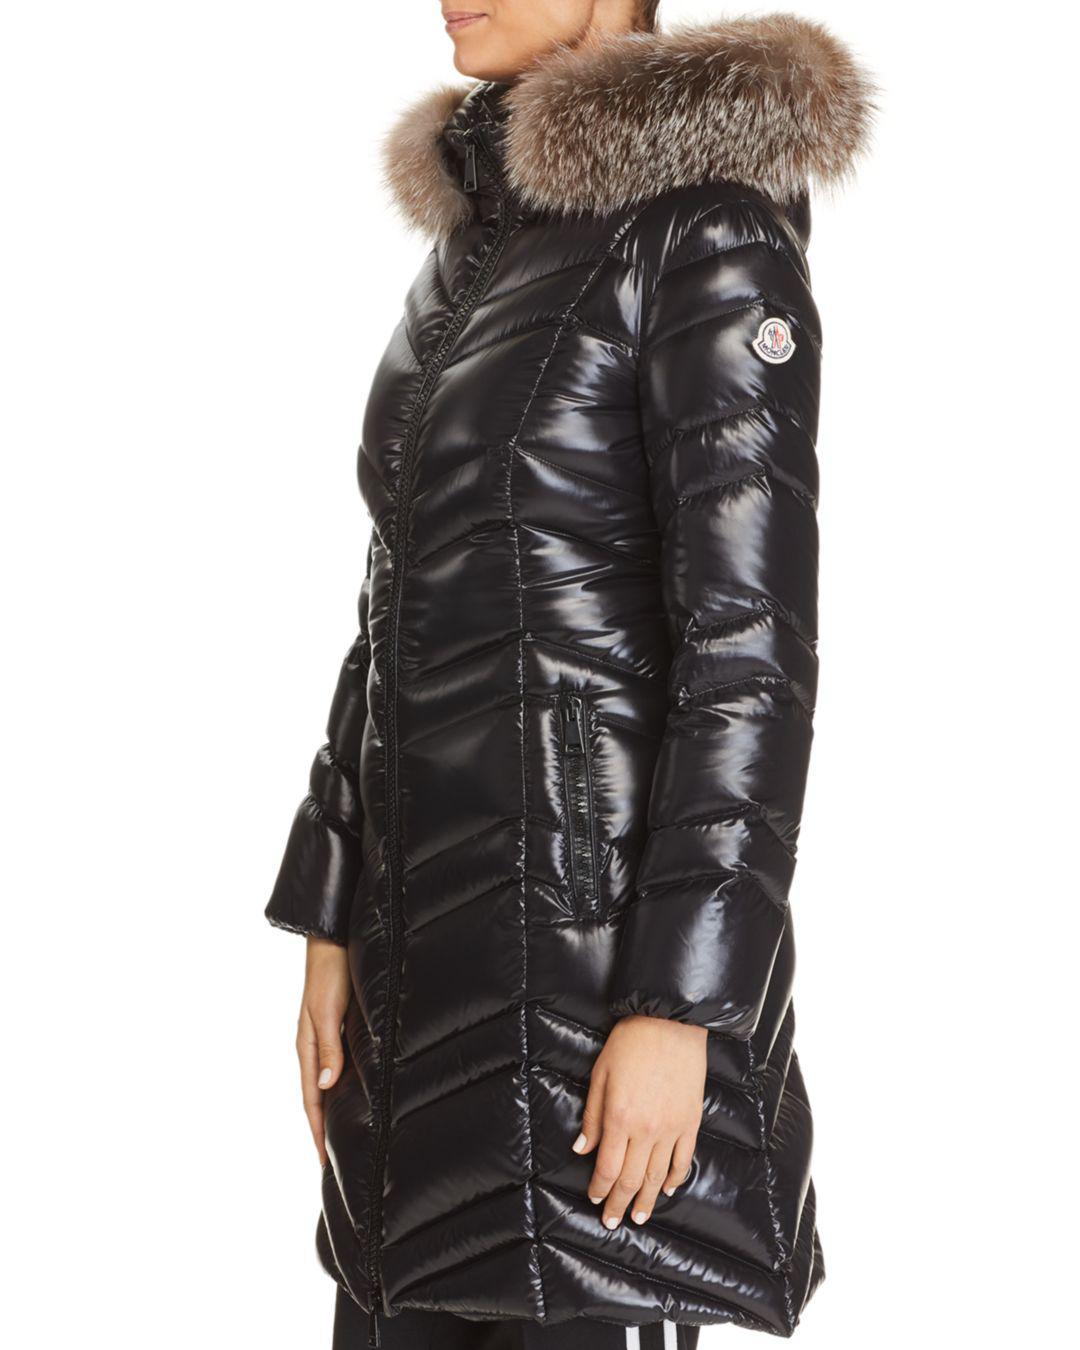 cfbff31b83e9 Moncler - Black Fulmar Fur Trim Jacket - Lyst. View fullscreen